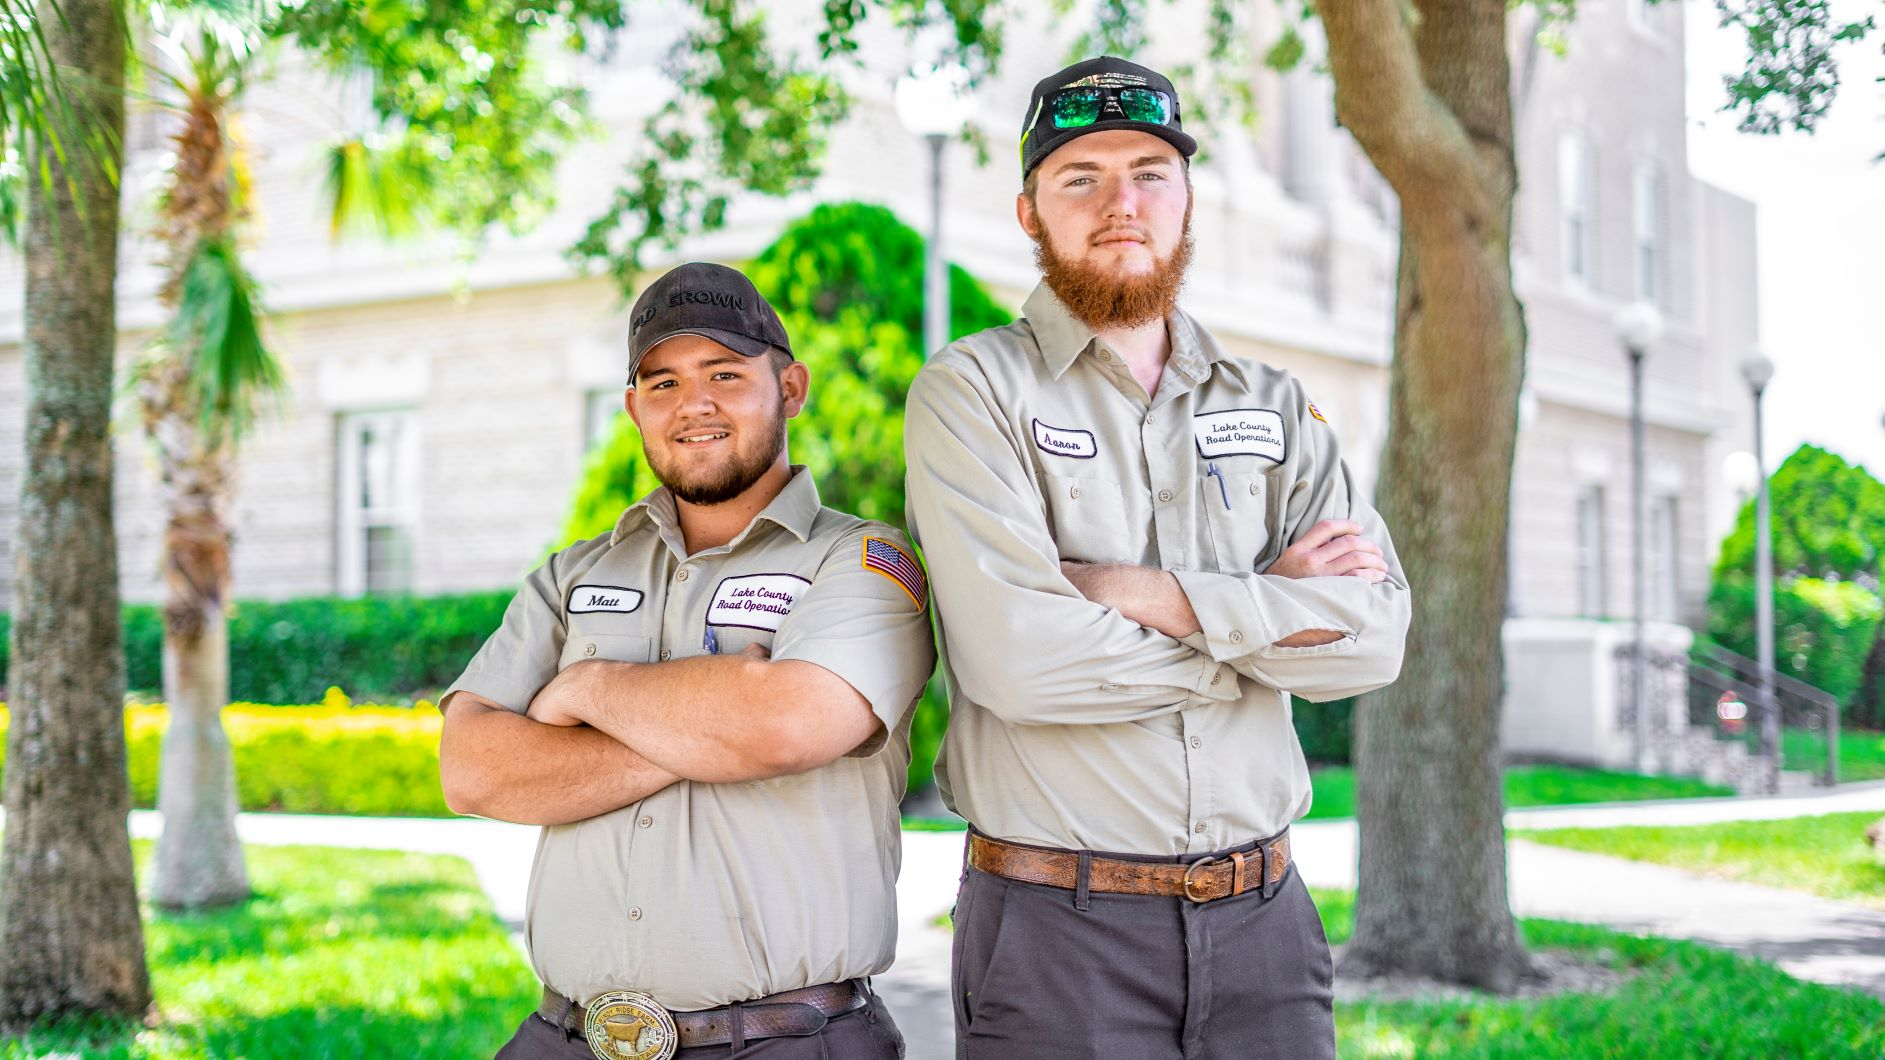 Lake County Road maintenance crew